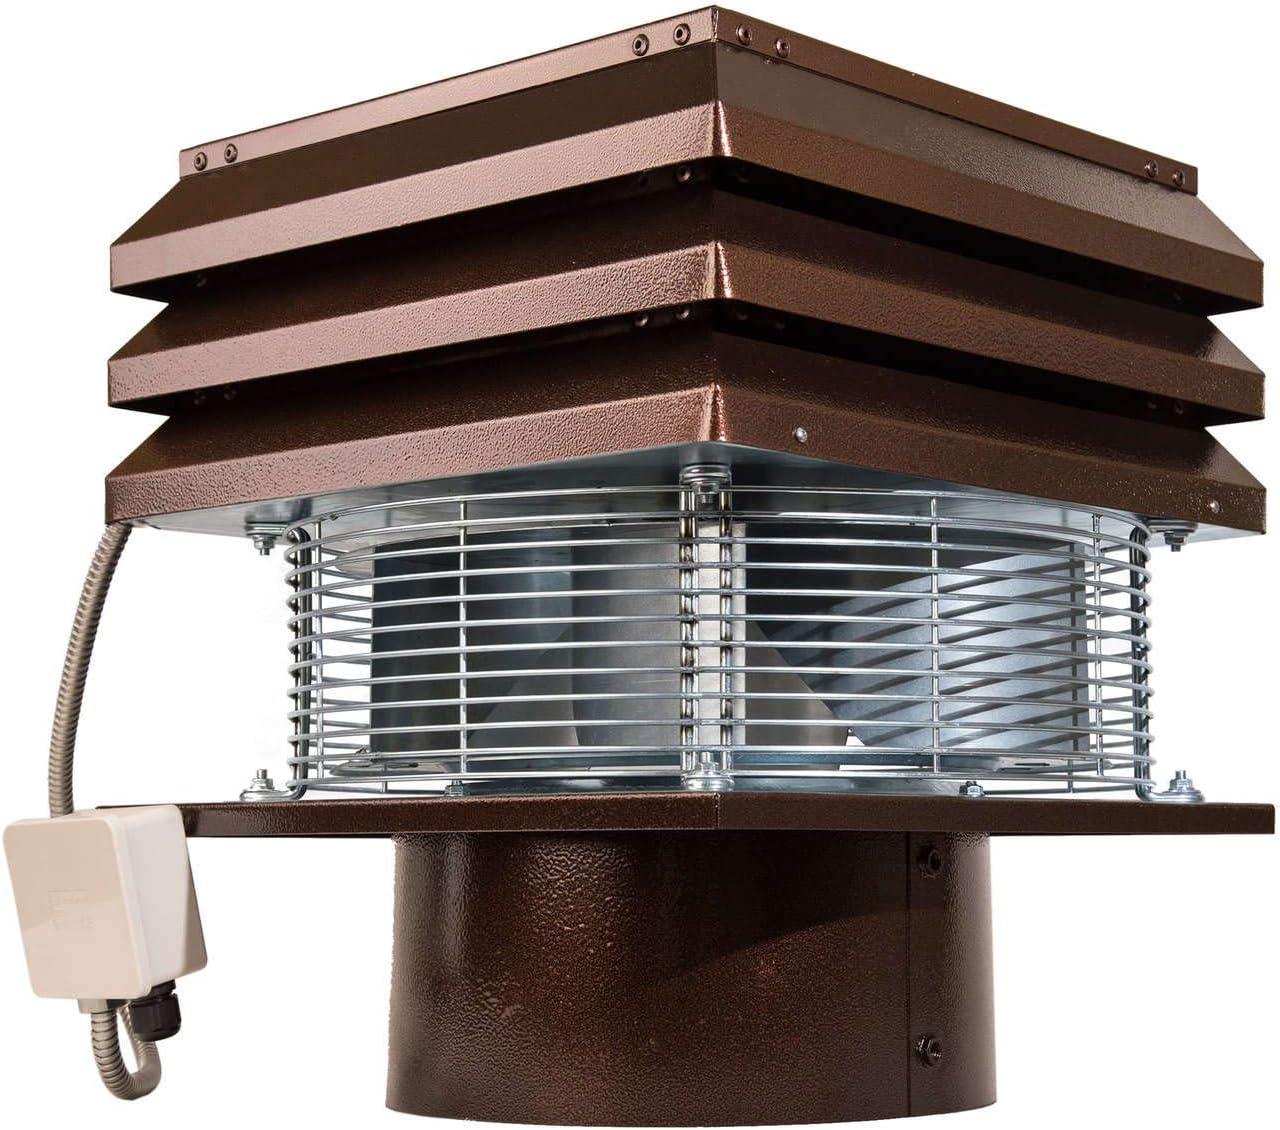 Extractor de humo Extractores de humo para chimeneas para barbacoa Aspirador de humos para chimenea extractor de chimenea extractor chimenea leña Gemi Elettronica modelo profesional redondo de 30 cm